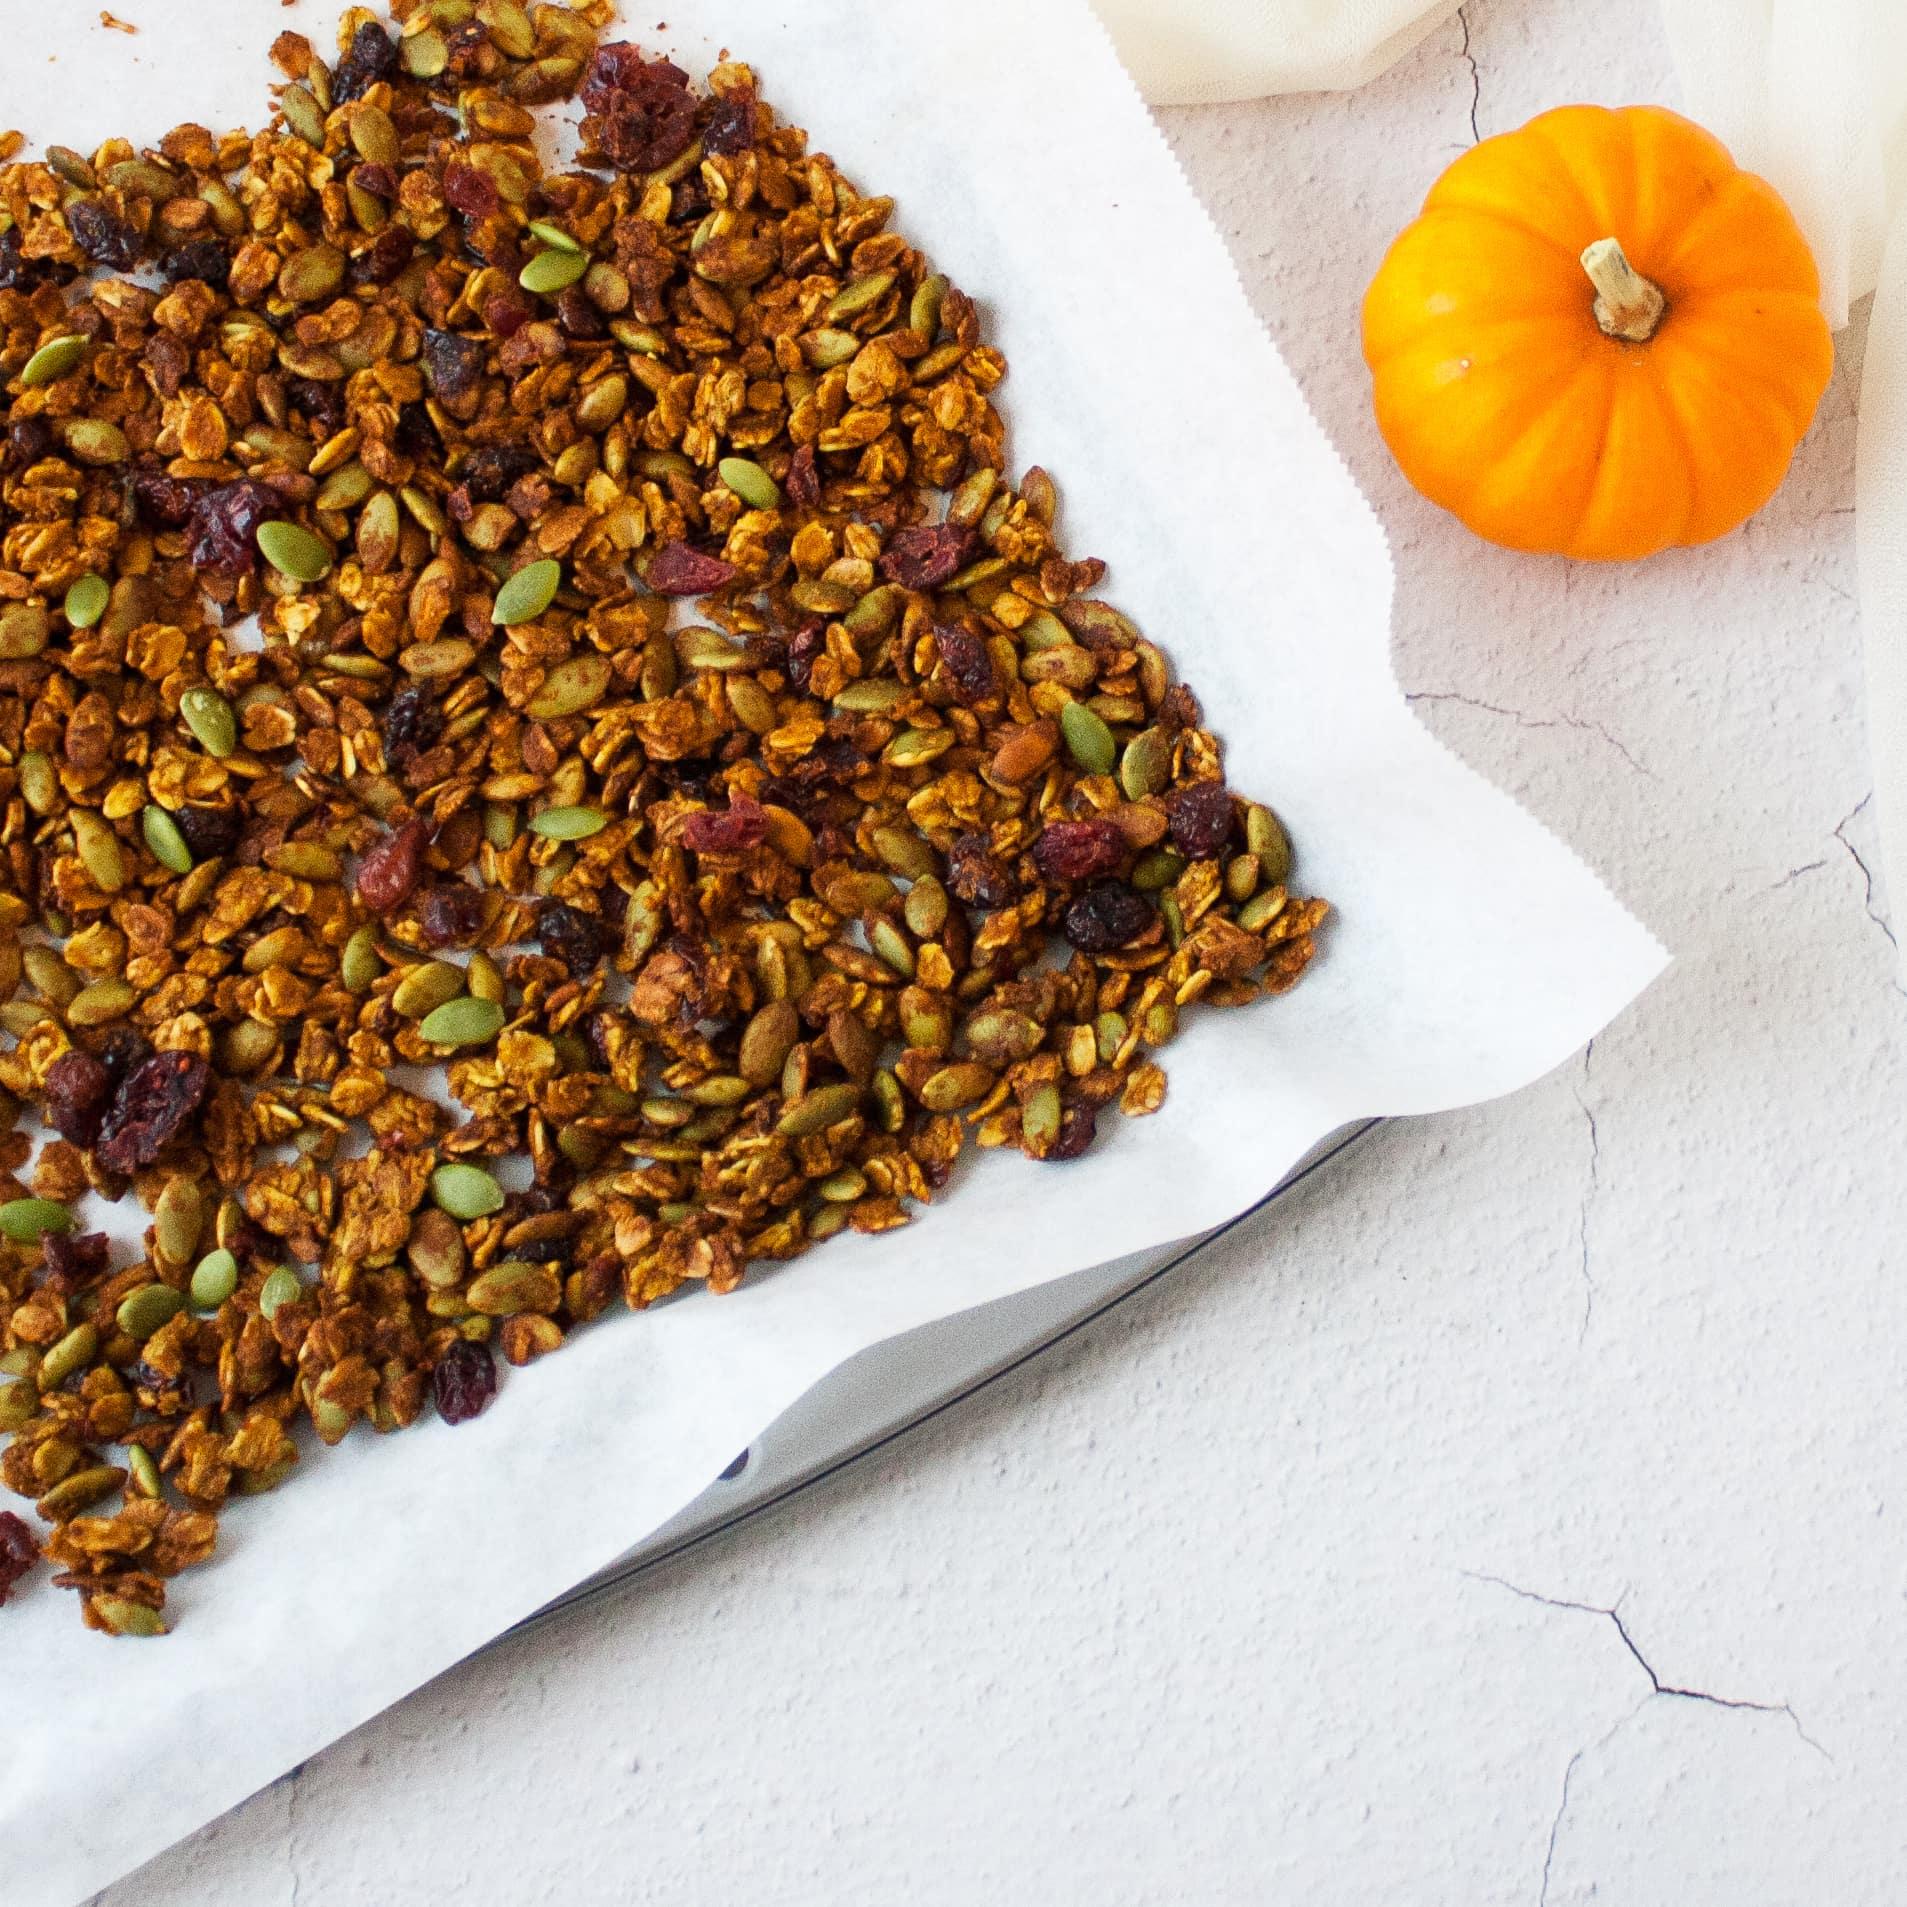 Freshly made pumpkin seed granola